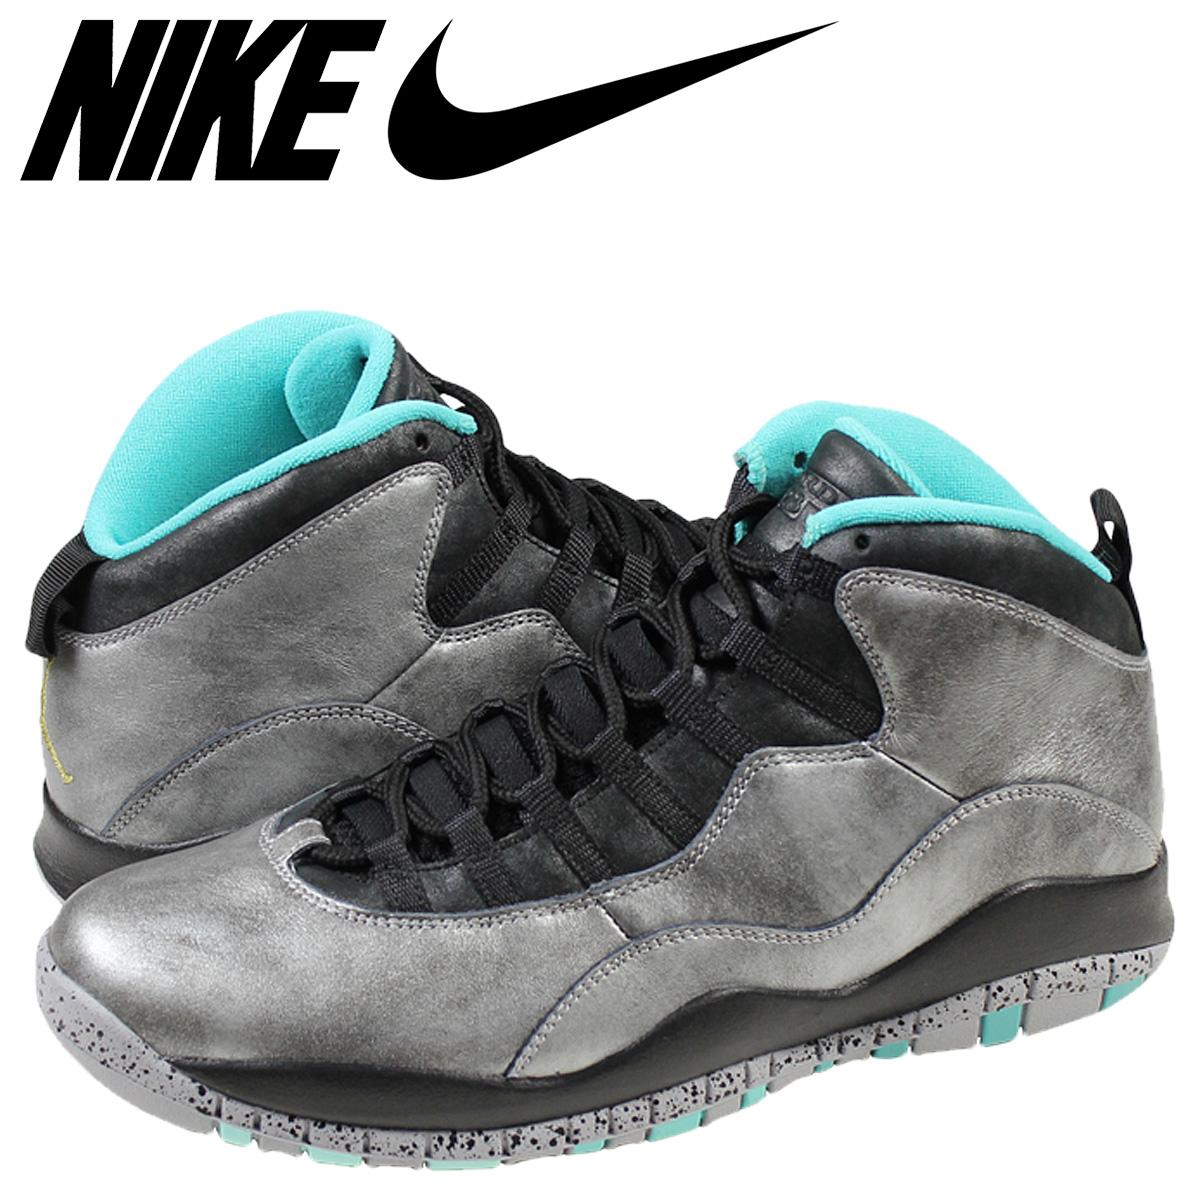 hot sales 749fb 4ff86 Nike NIKE Air Jordan 10 nostalgic sneakers AIR JORDAN 10 RETRO LADY LIBERTY  lady liberty 705,178-045 dust metallic gold men